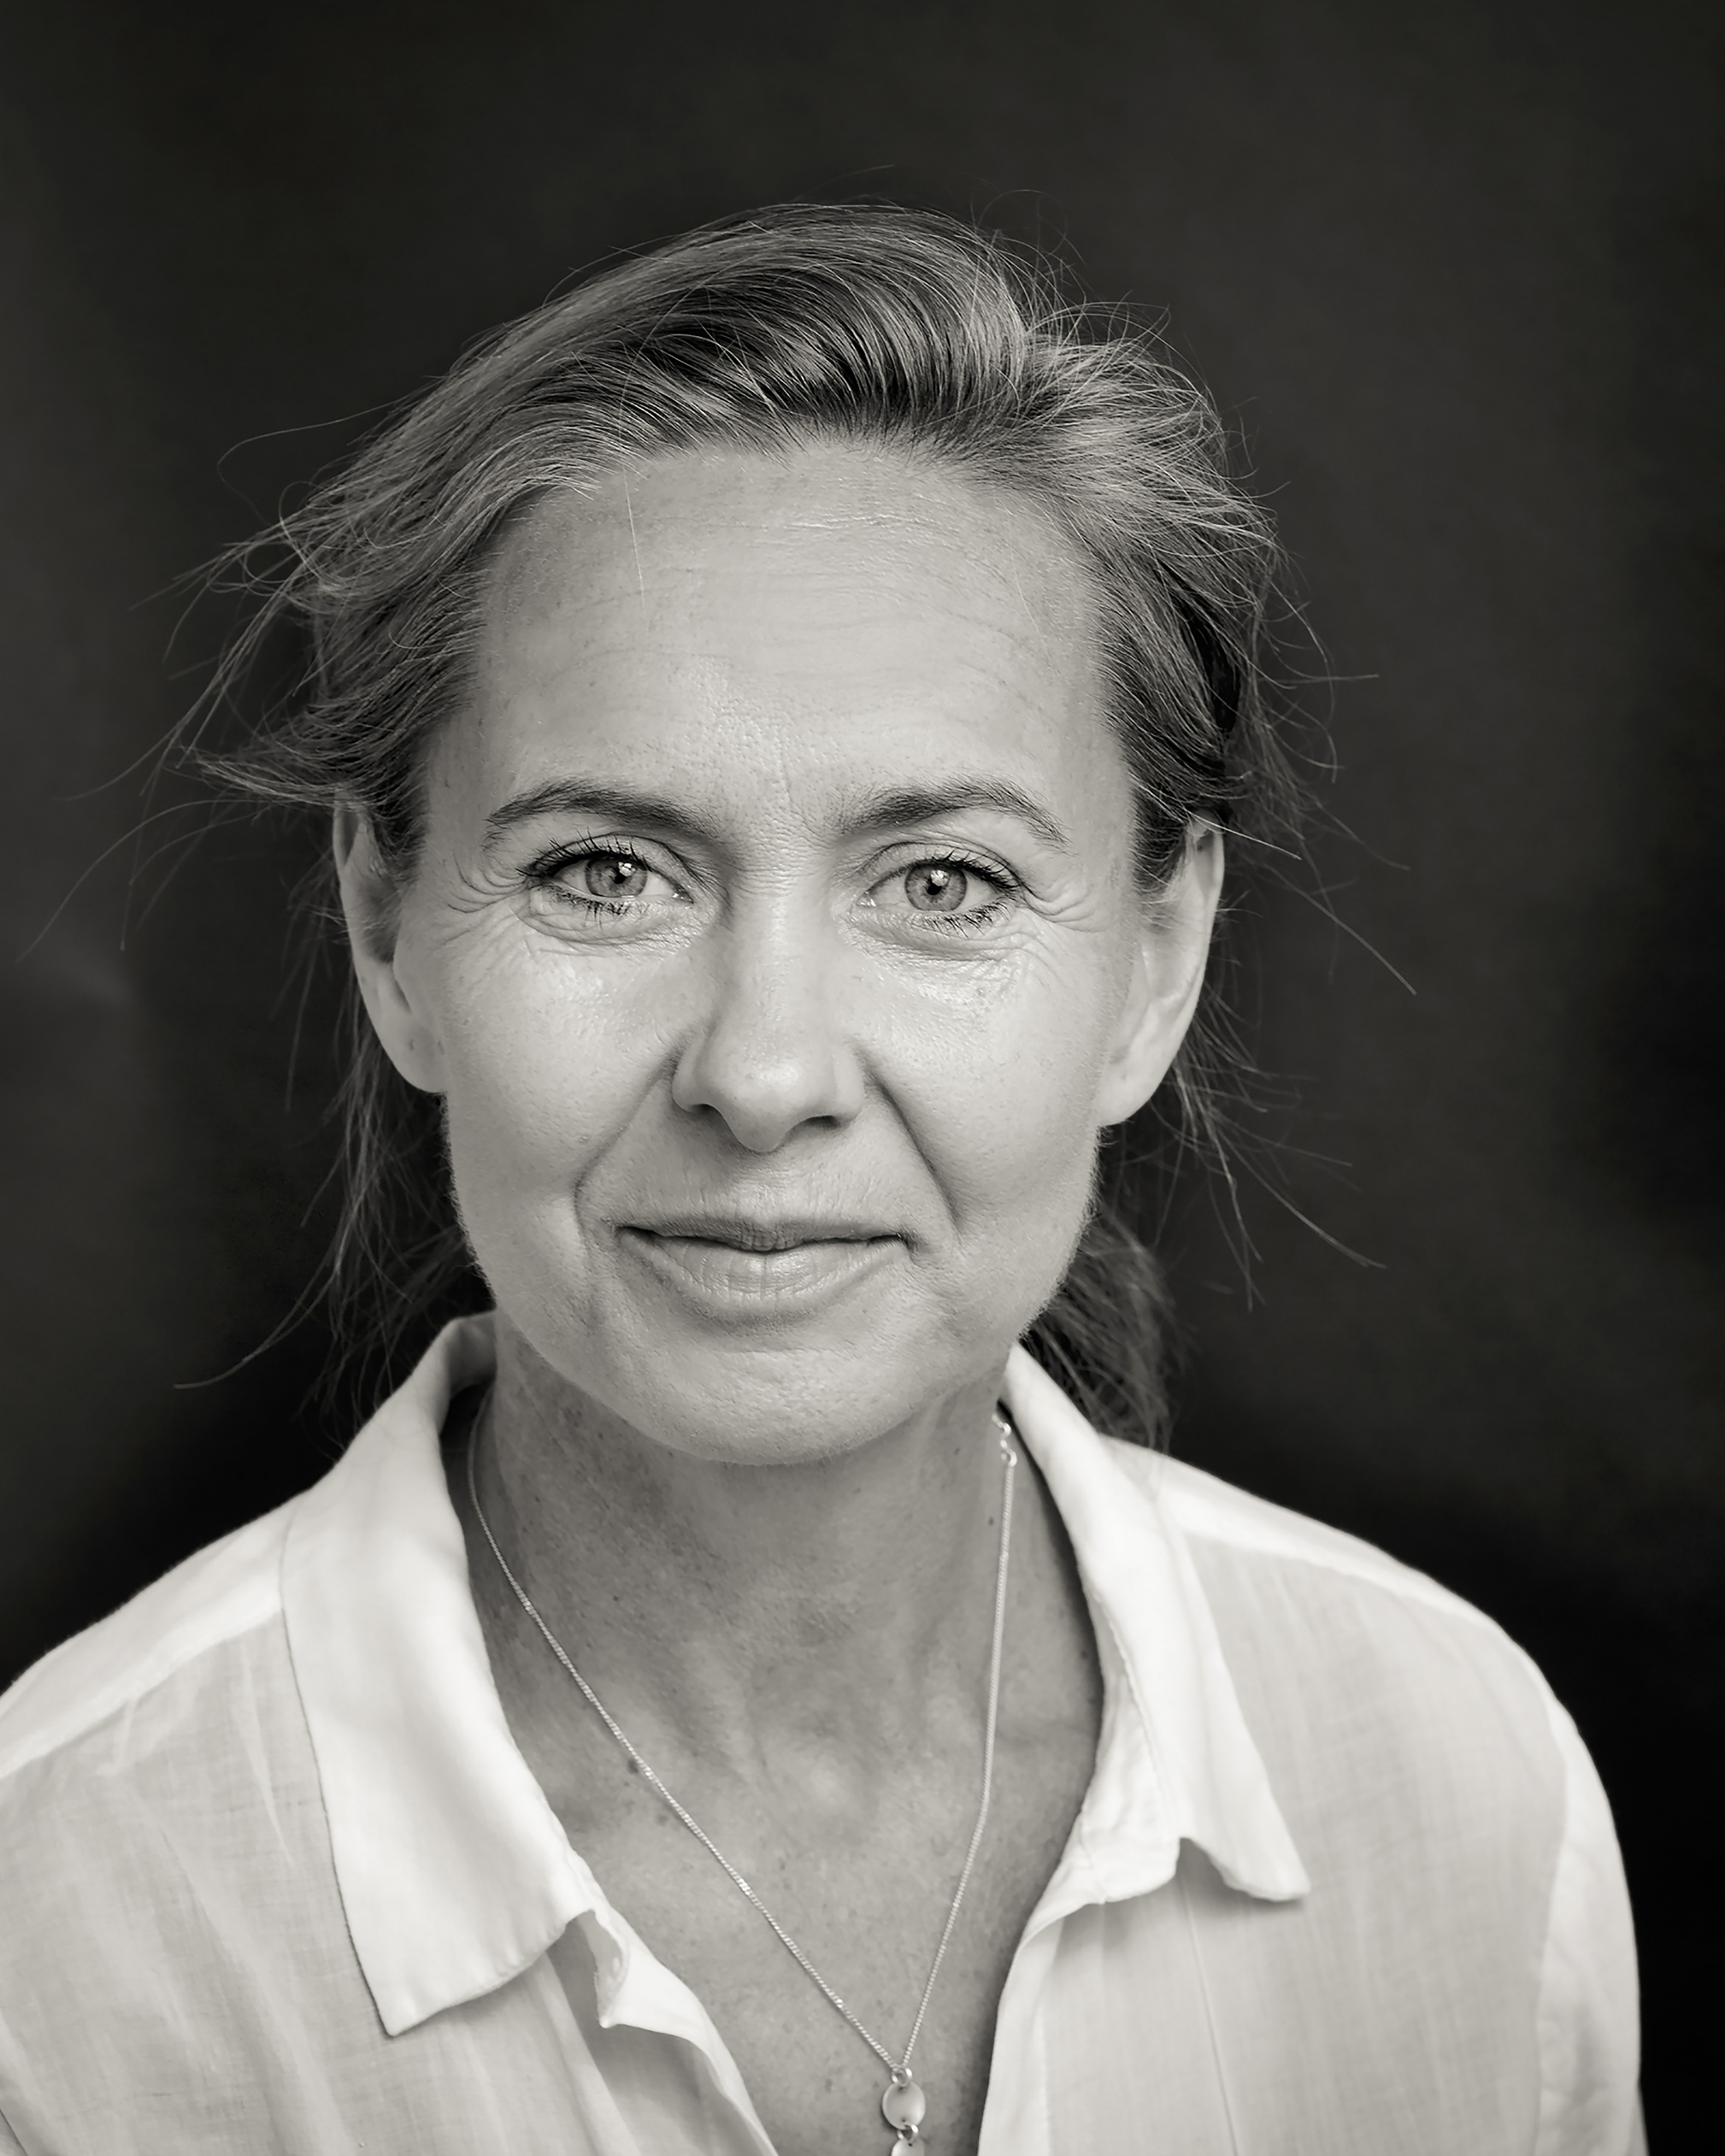 Lena Granefelt